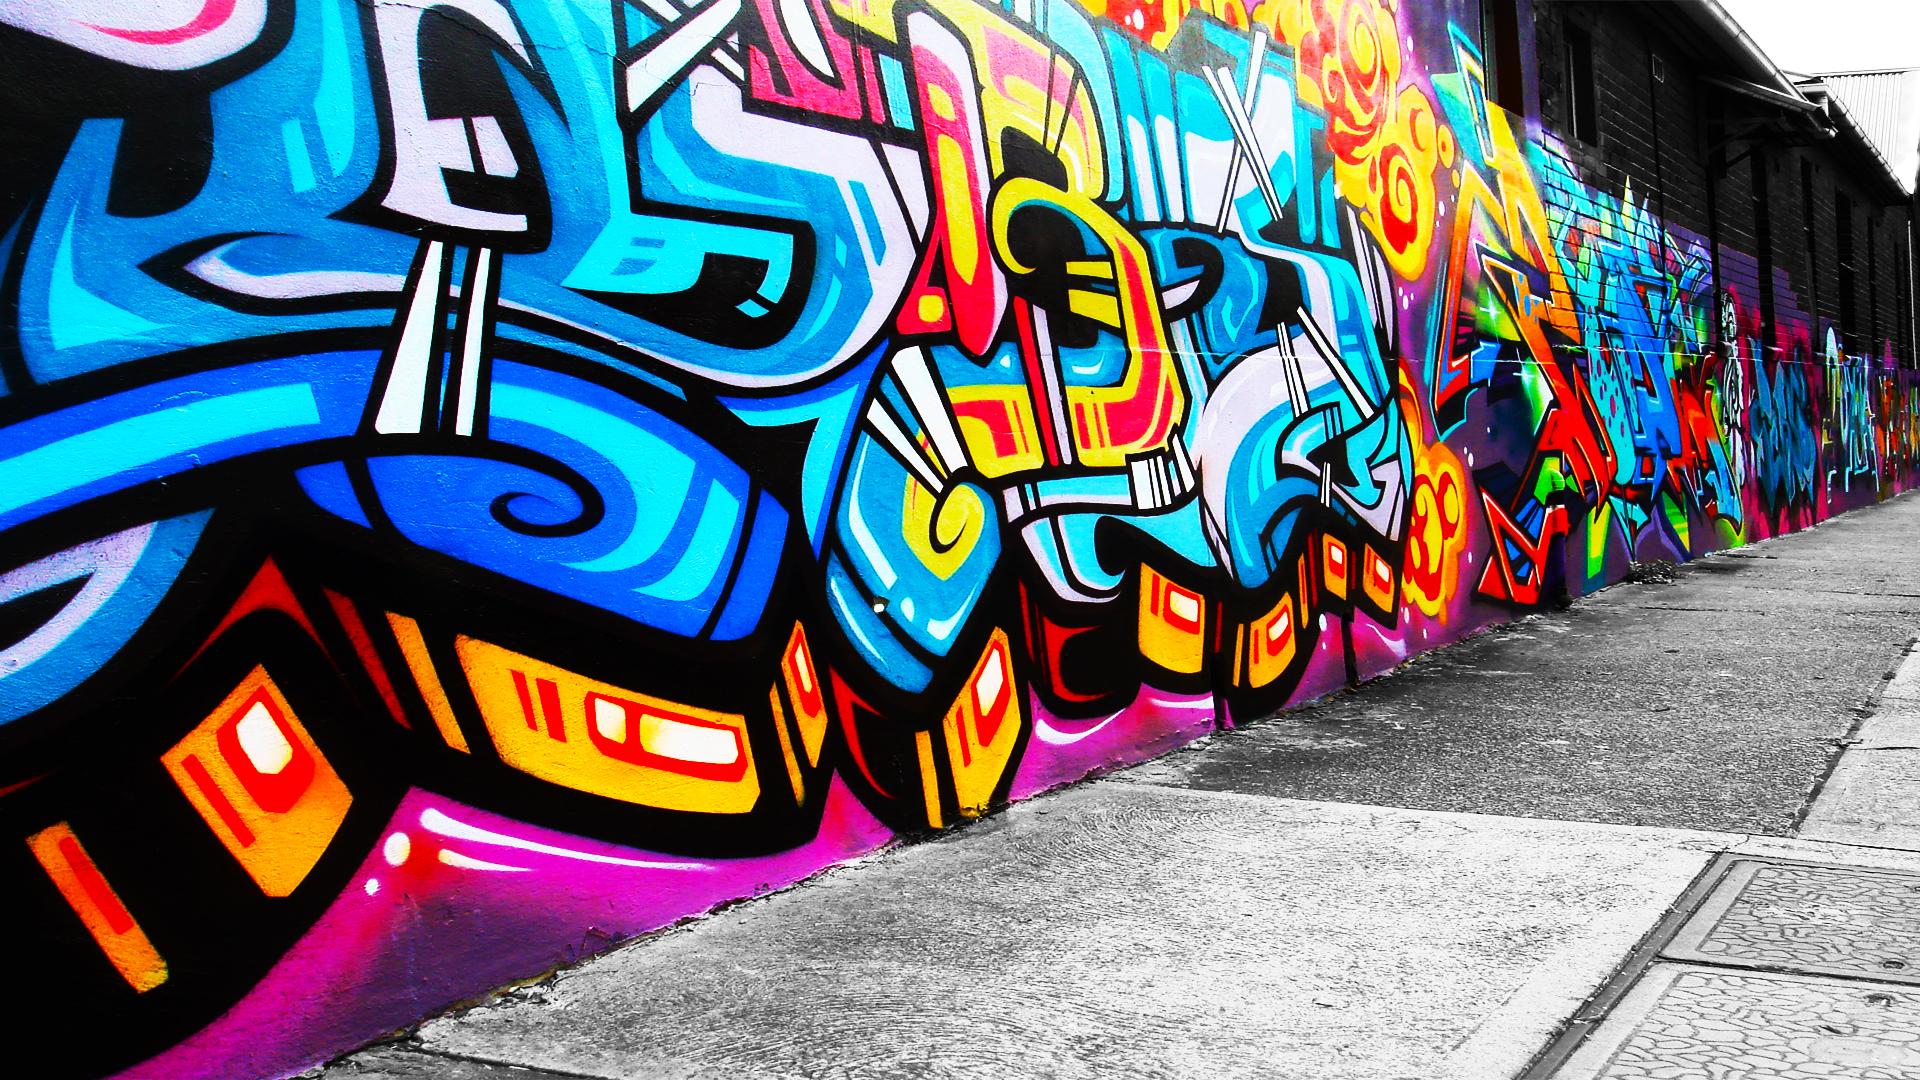 Home Digital Art Graffiti Background 1920x1080